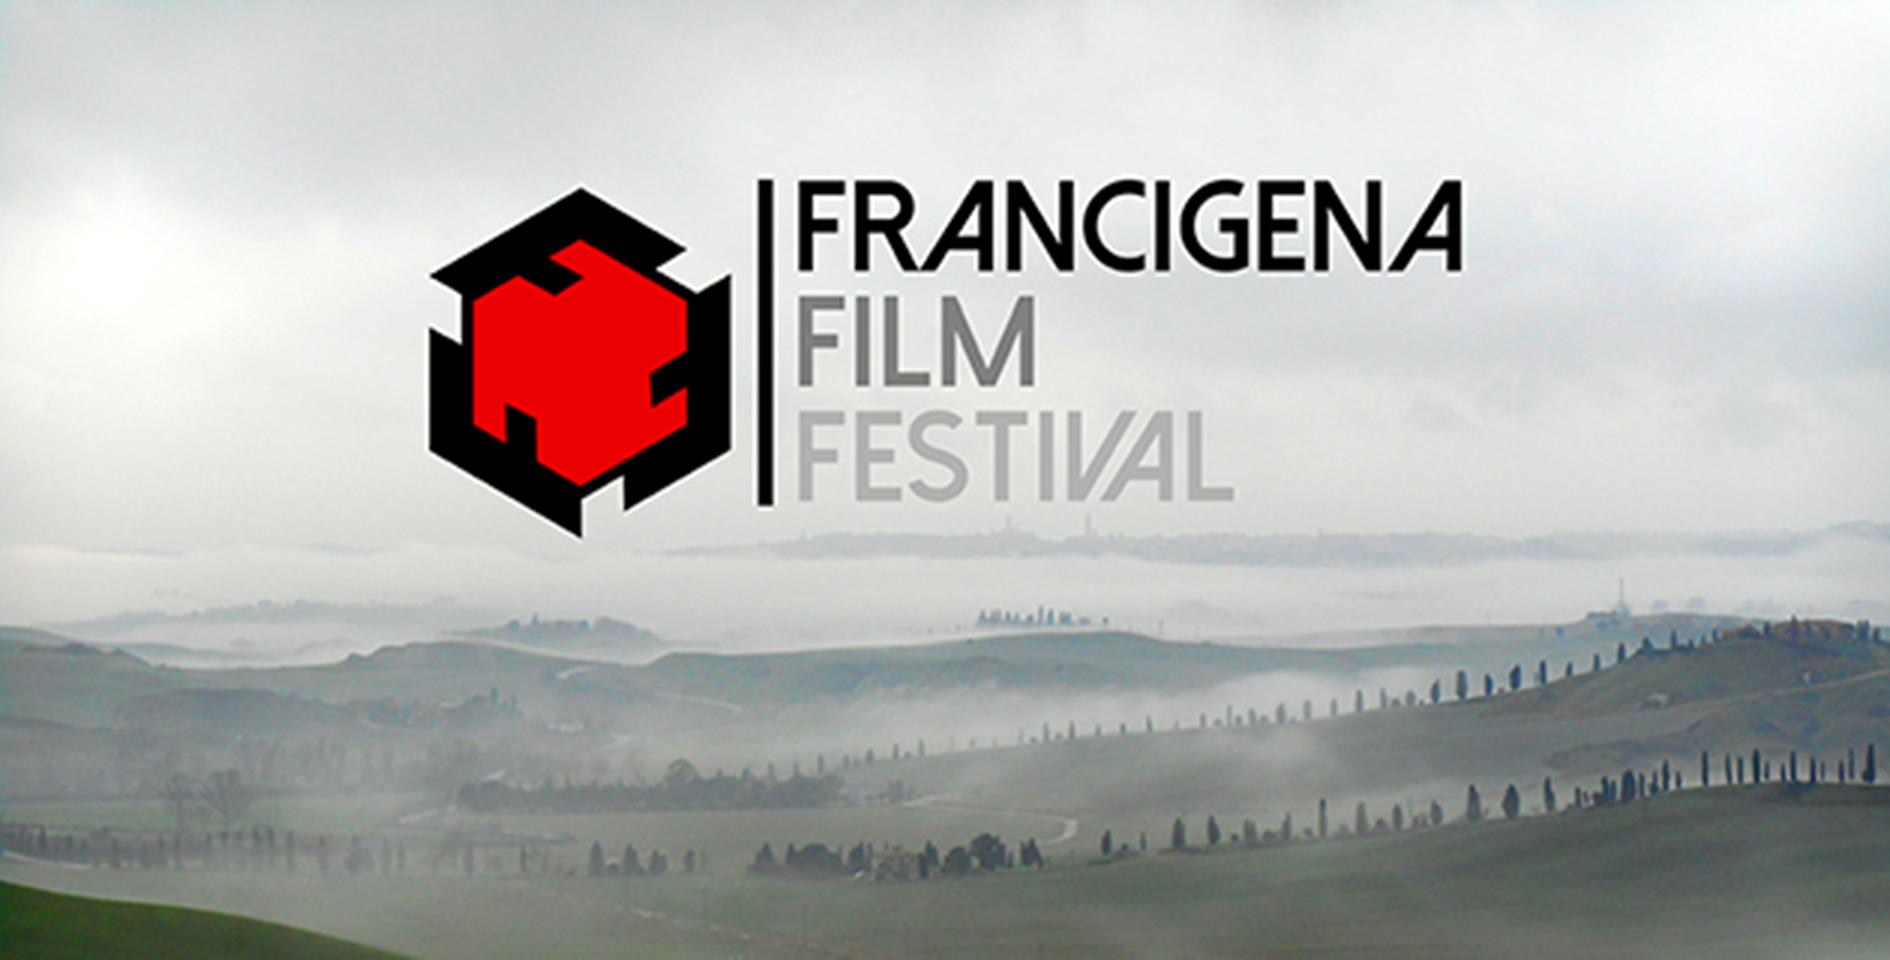 FRANCIGENA FILM FESTIVAL